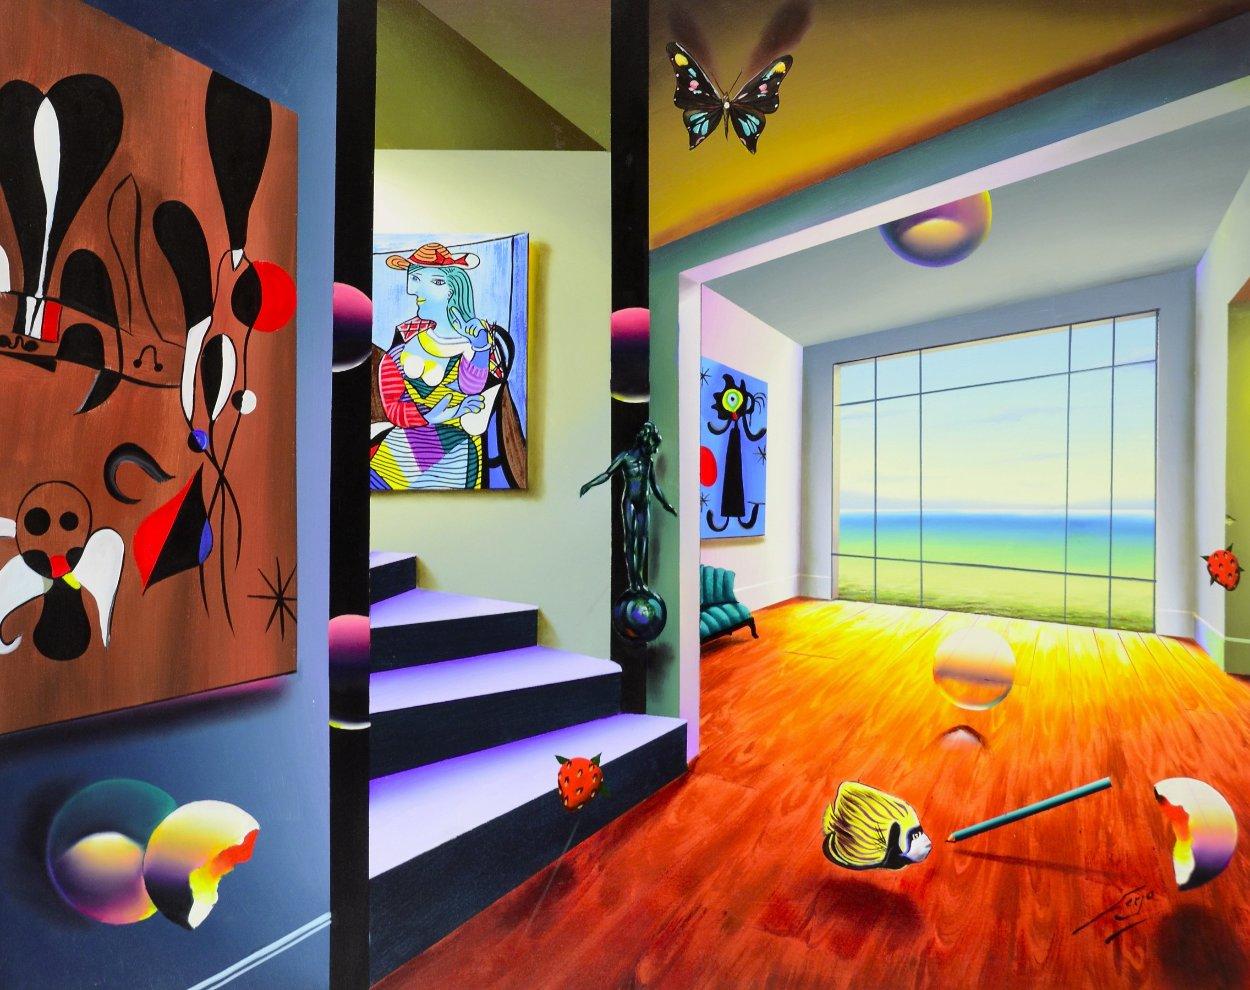 Gallery 2009 40x50 Super Huge Original Painting by (Fernando de Jesus Oliviera) Ferjo